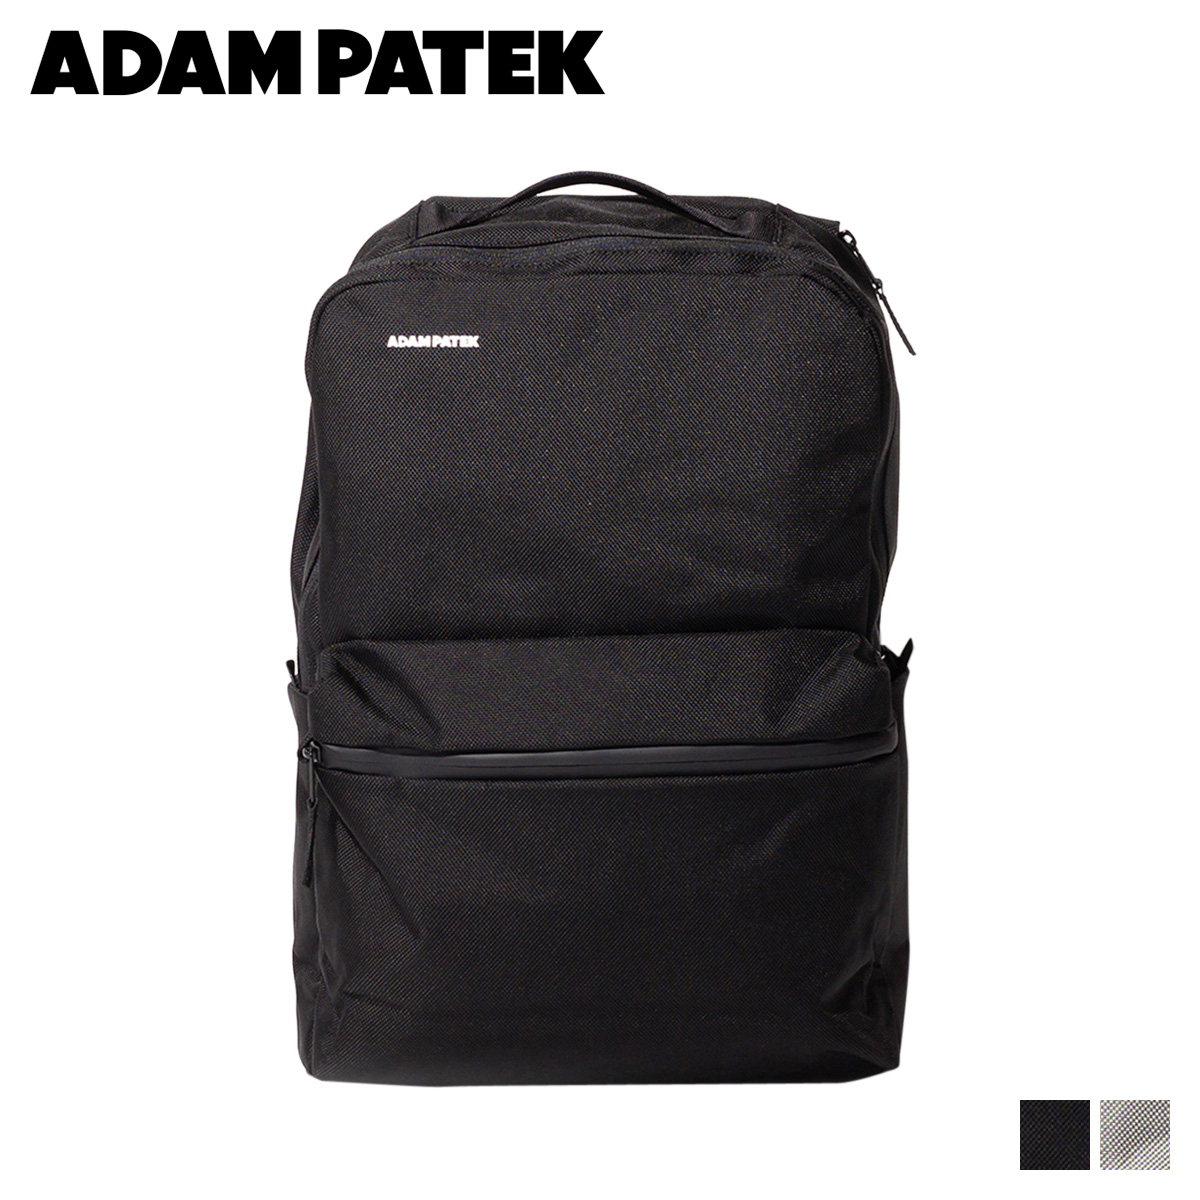 ADAM PATEK BOISE SQUARE PACK アダムパテック バッグ リュック バックパック メンズ レディース ブラック グレー 黒 AMPK-B042